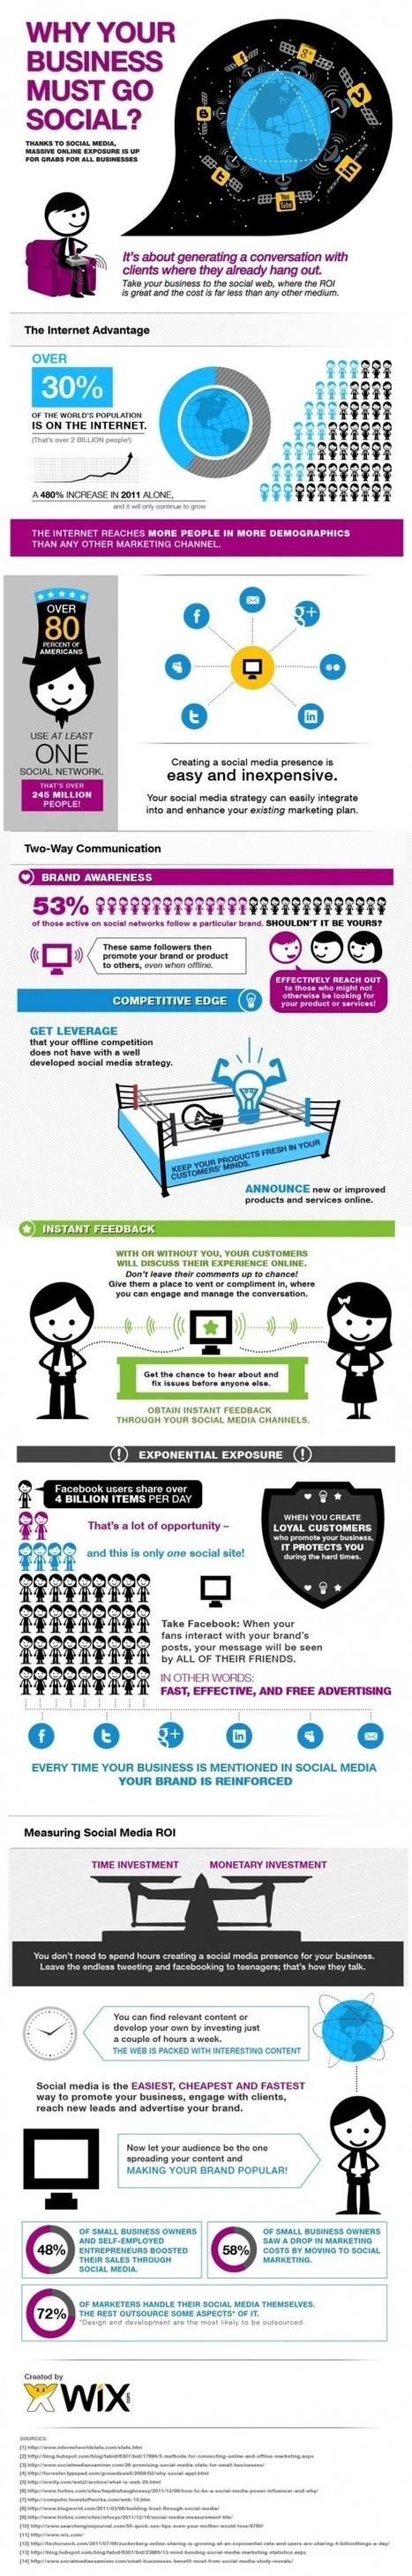 Marketing, PR, Sales, SEO, Social media, Online business, Consulting | Marketing | Scoop.it